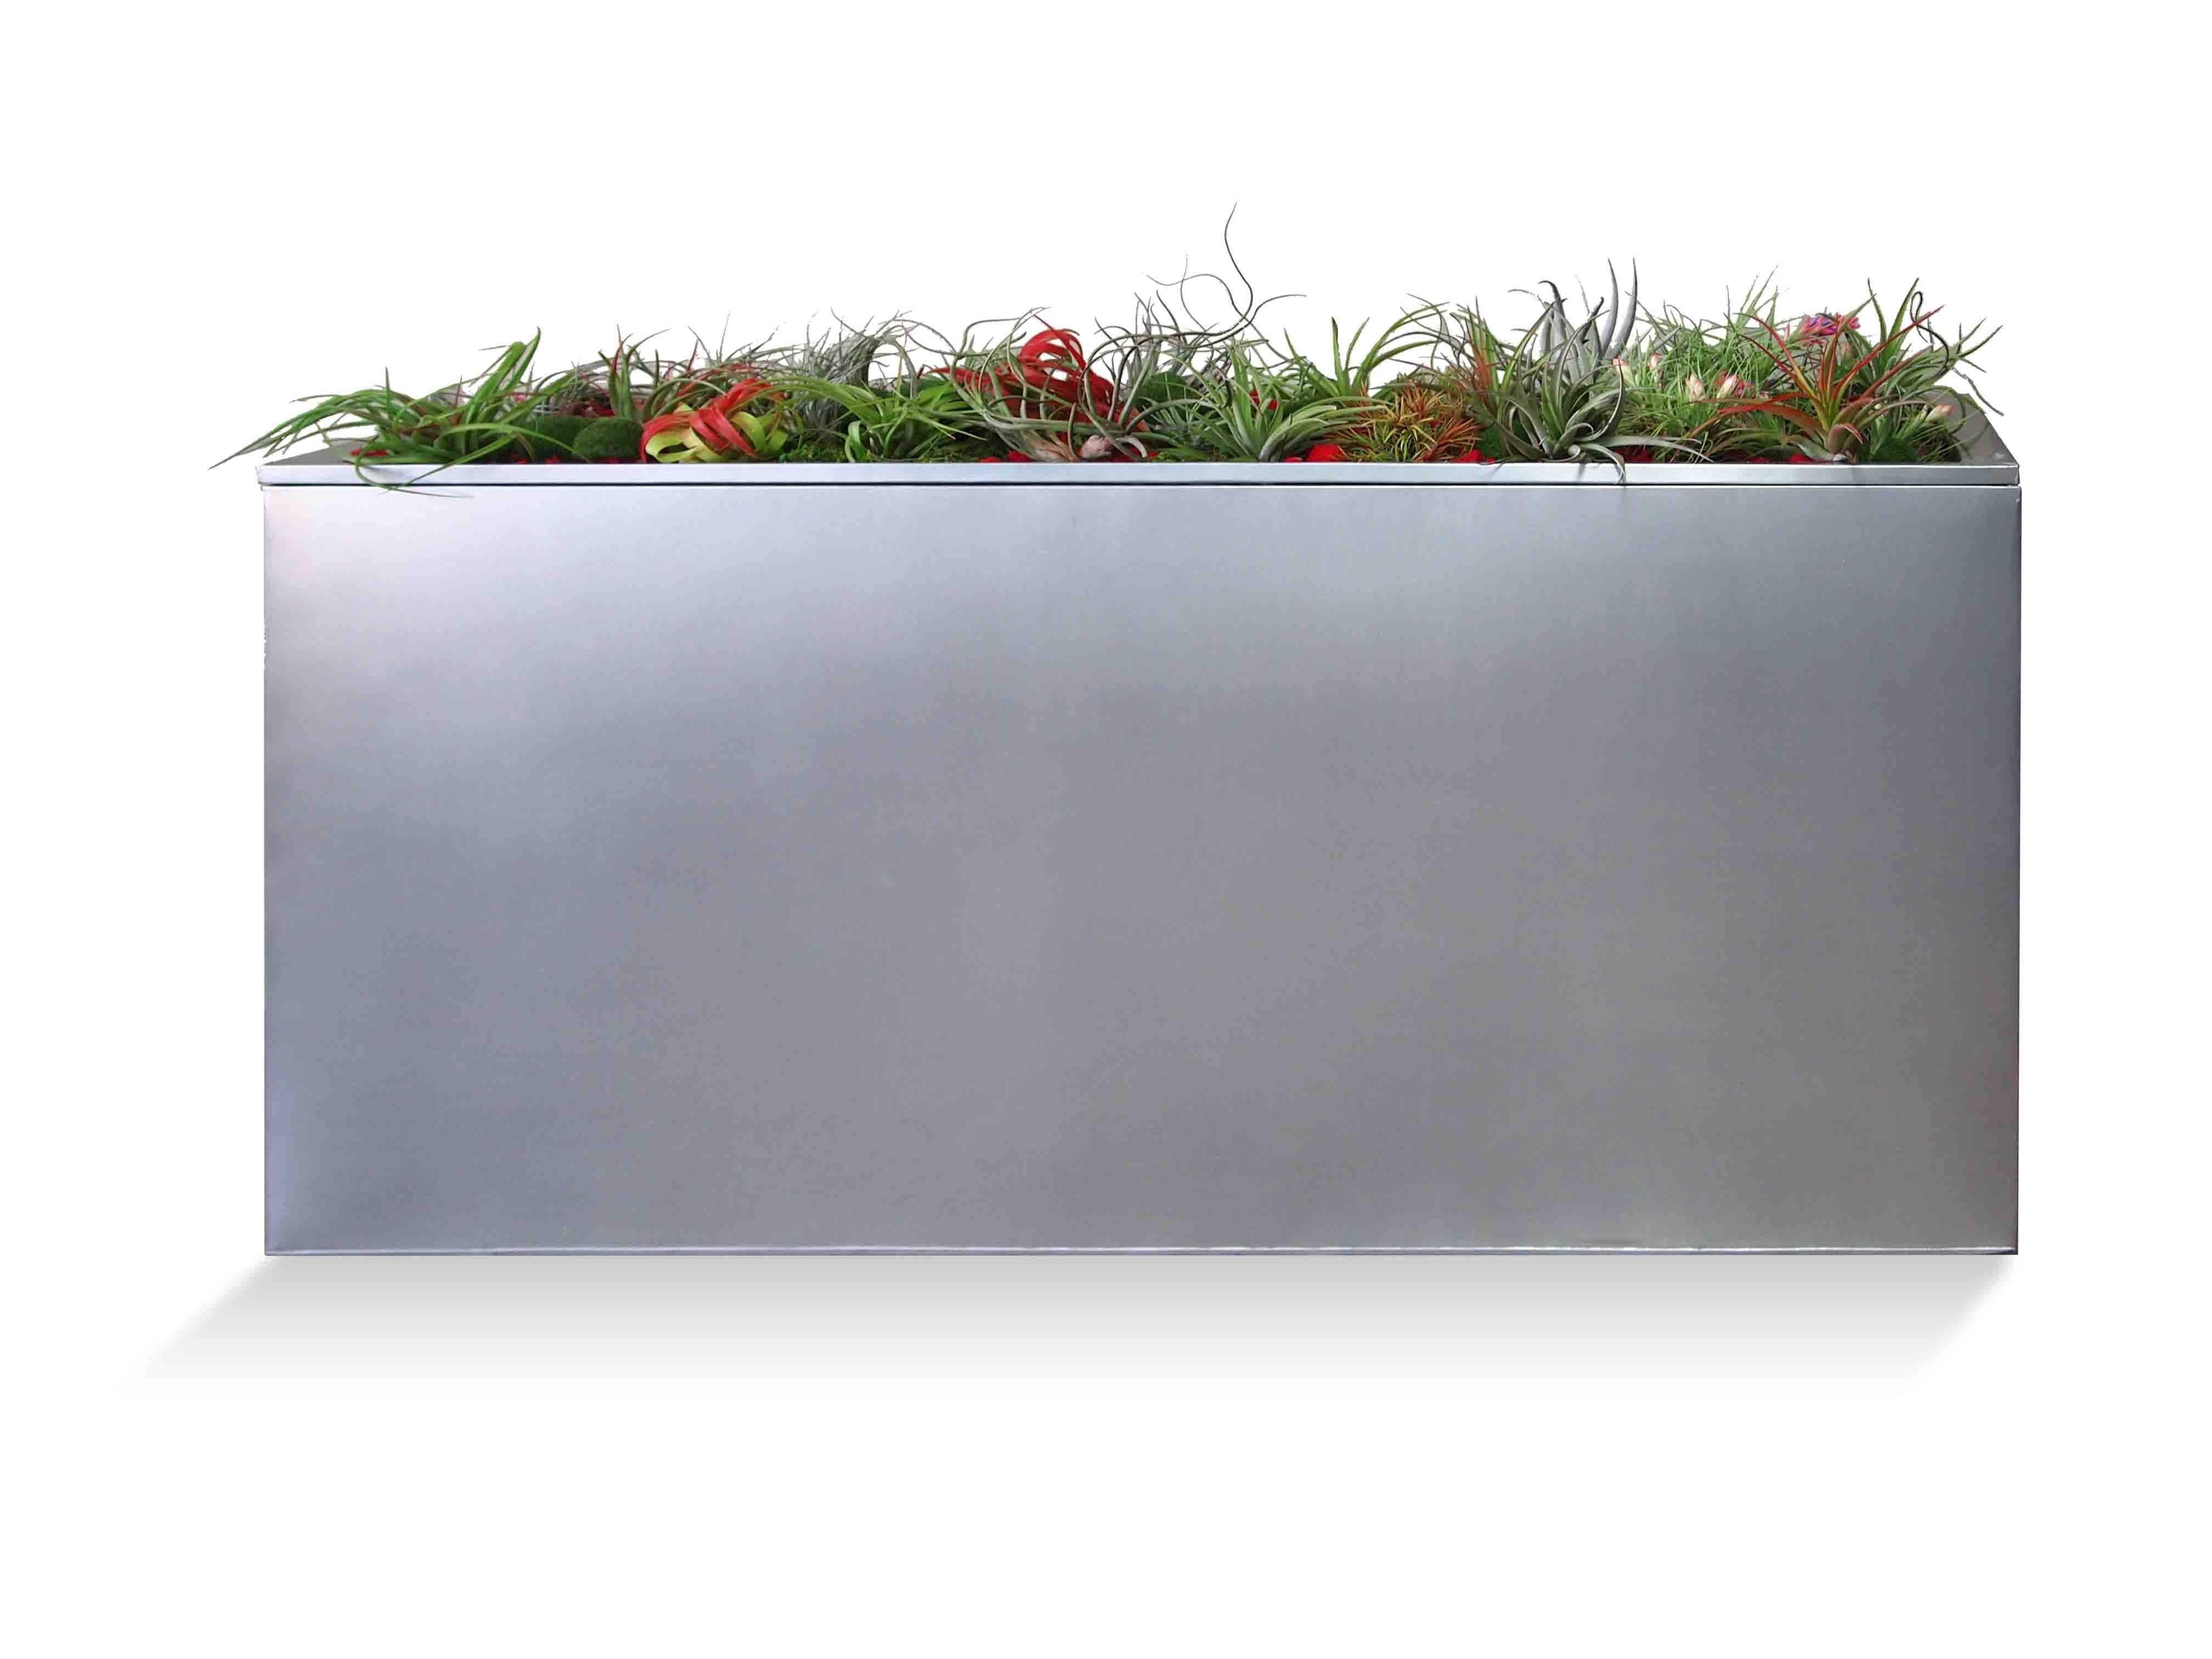 Tolga Rectangular Planter Box With Images Planters Modern